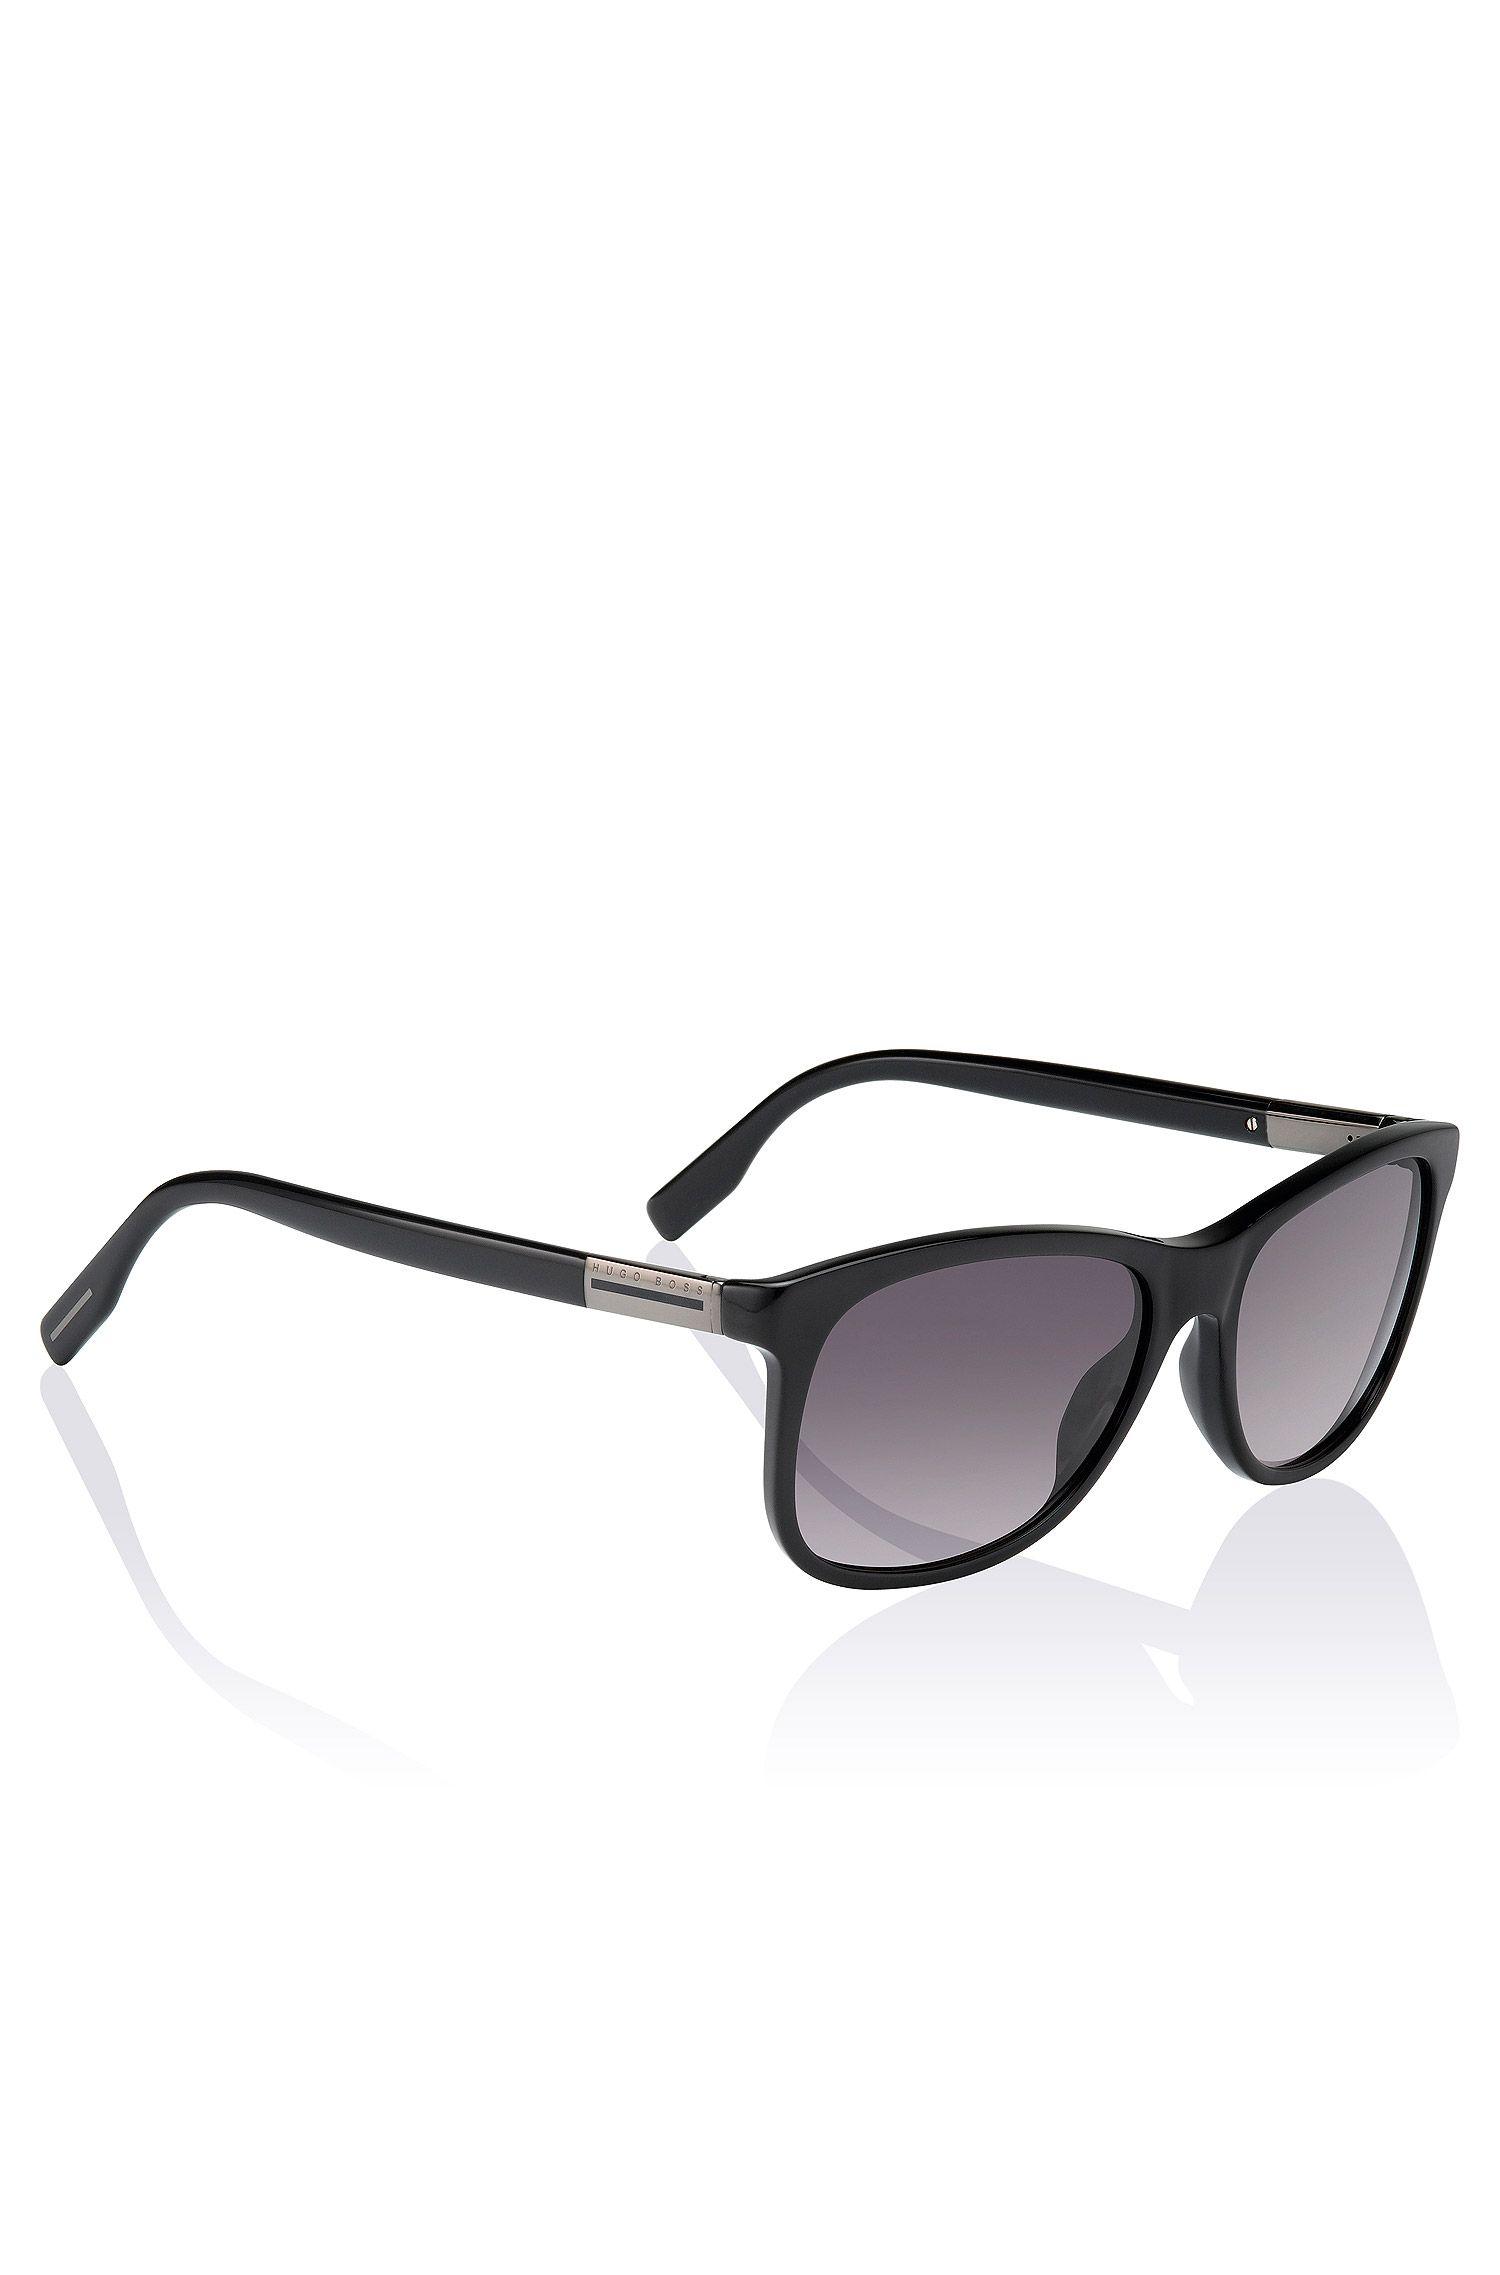 Sonnenbrille ´BOSS 0555/S`